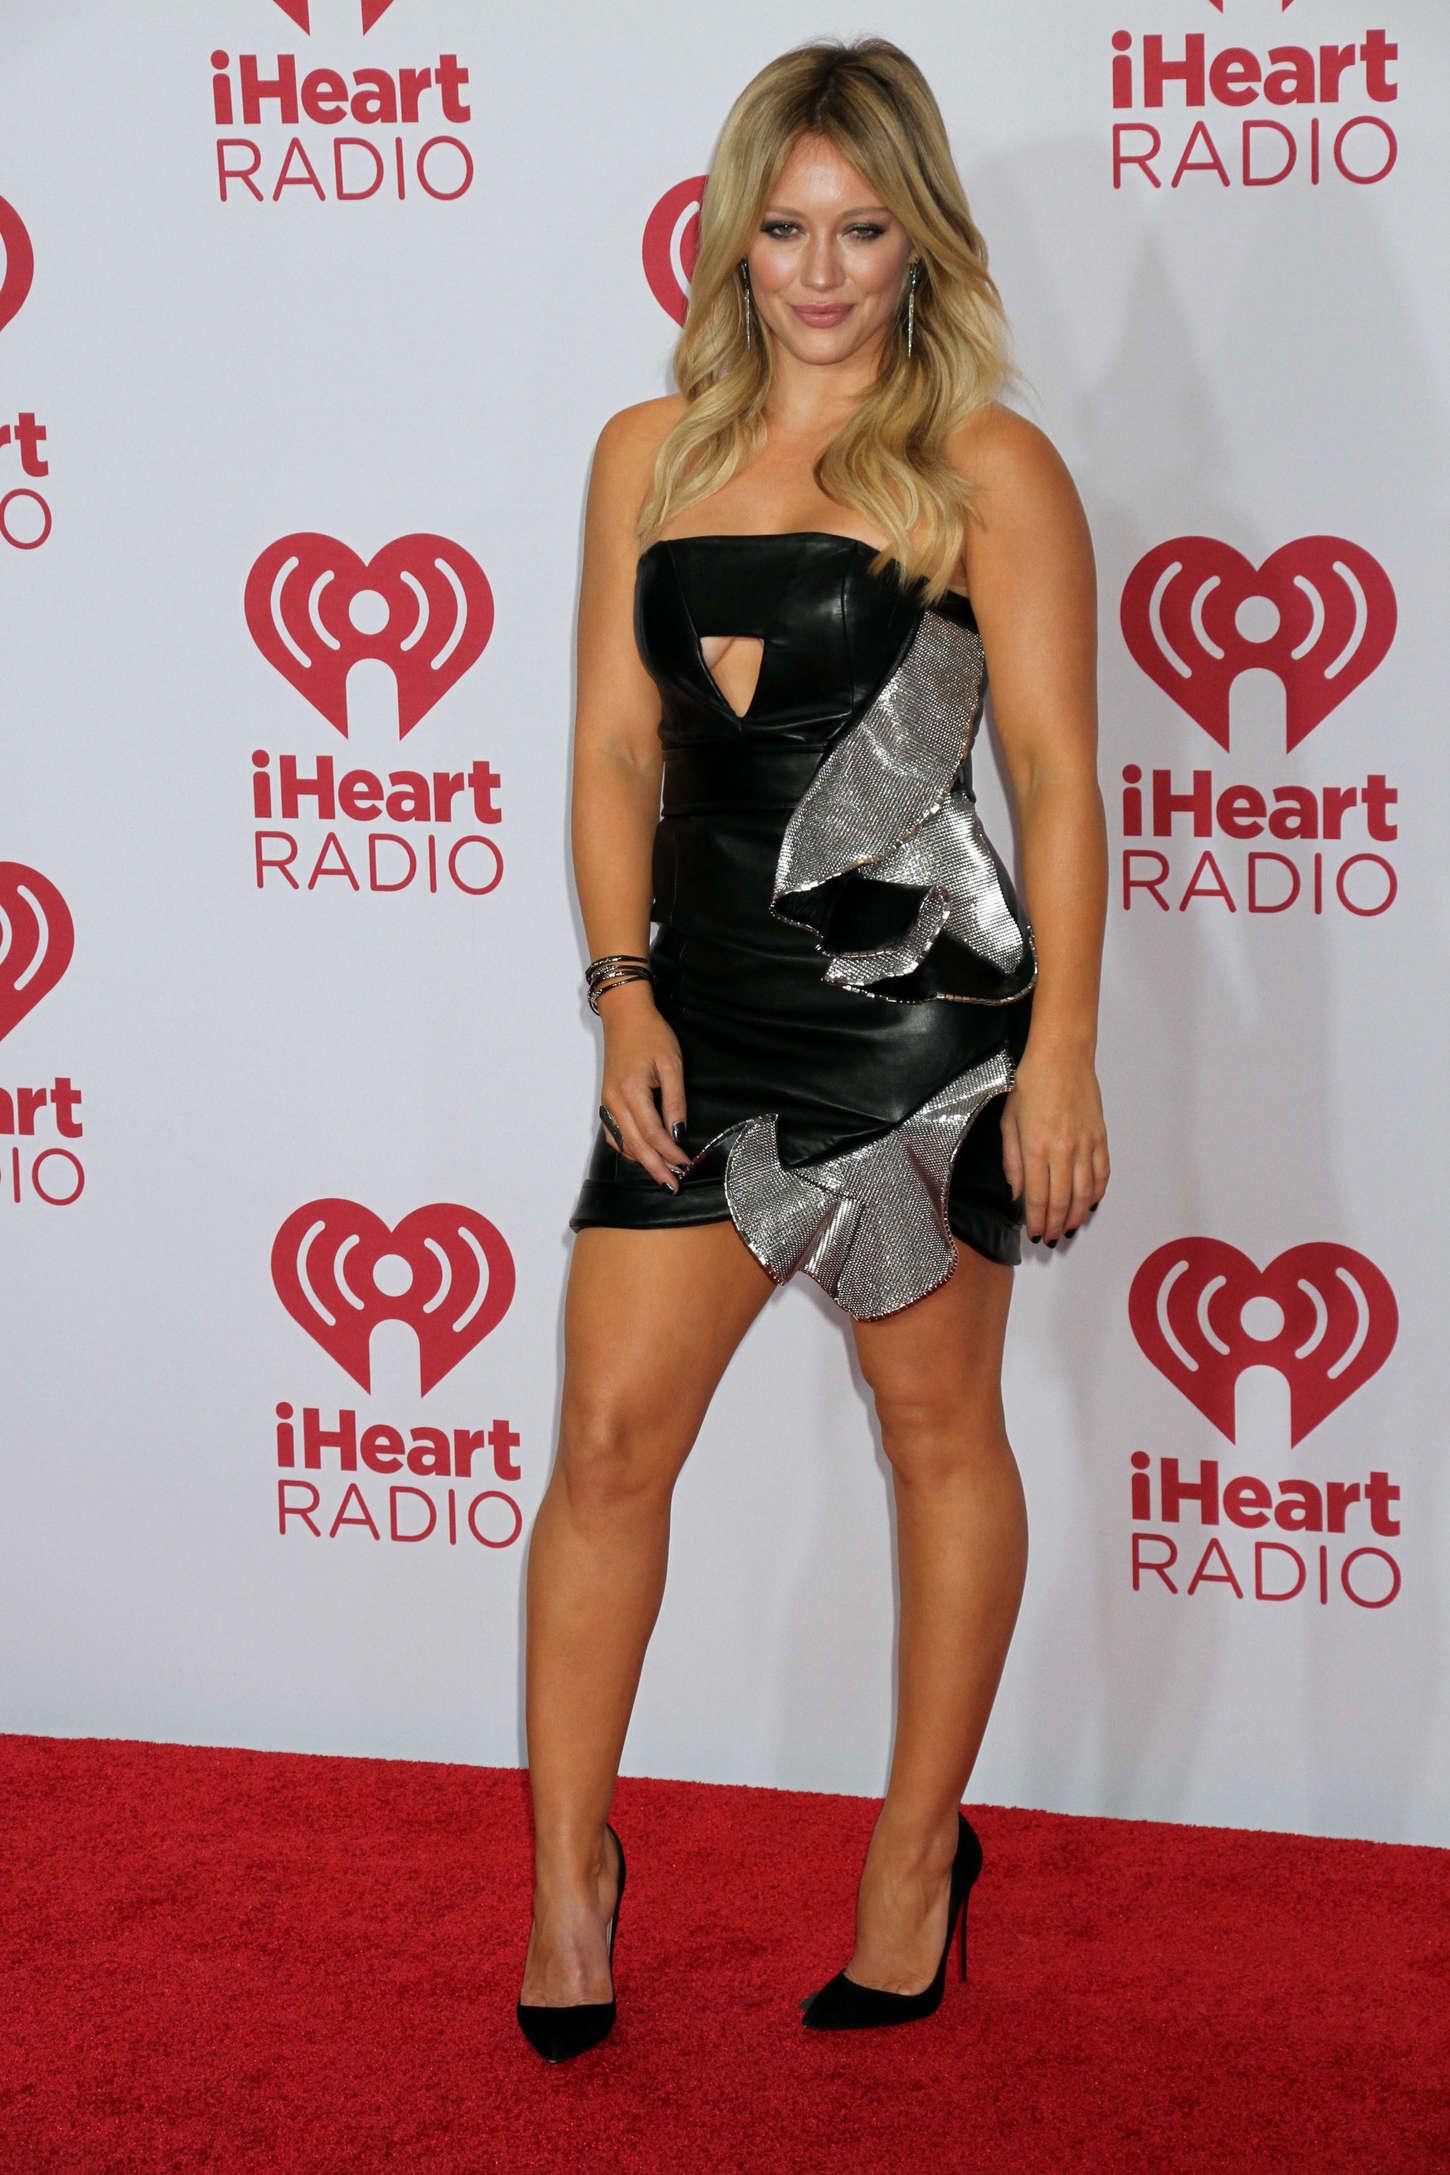 Hilary Duff - 2014 iHeartRadio Music Festival in Las Vegas